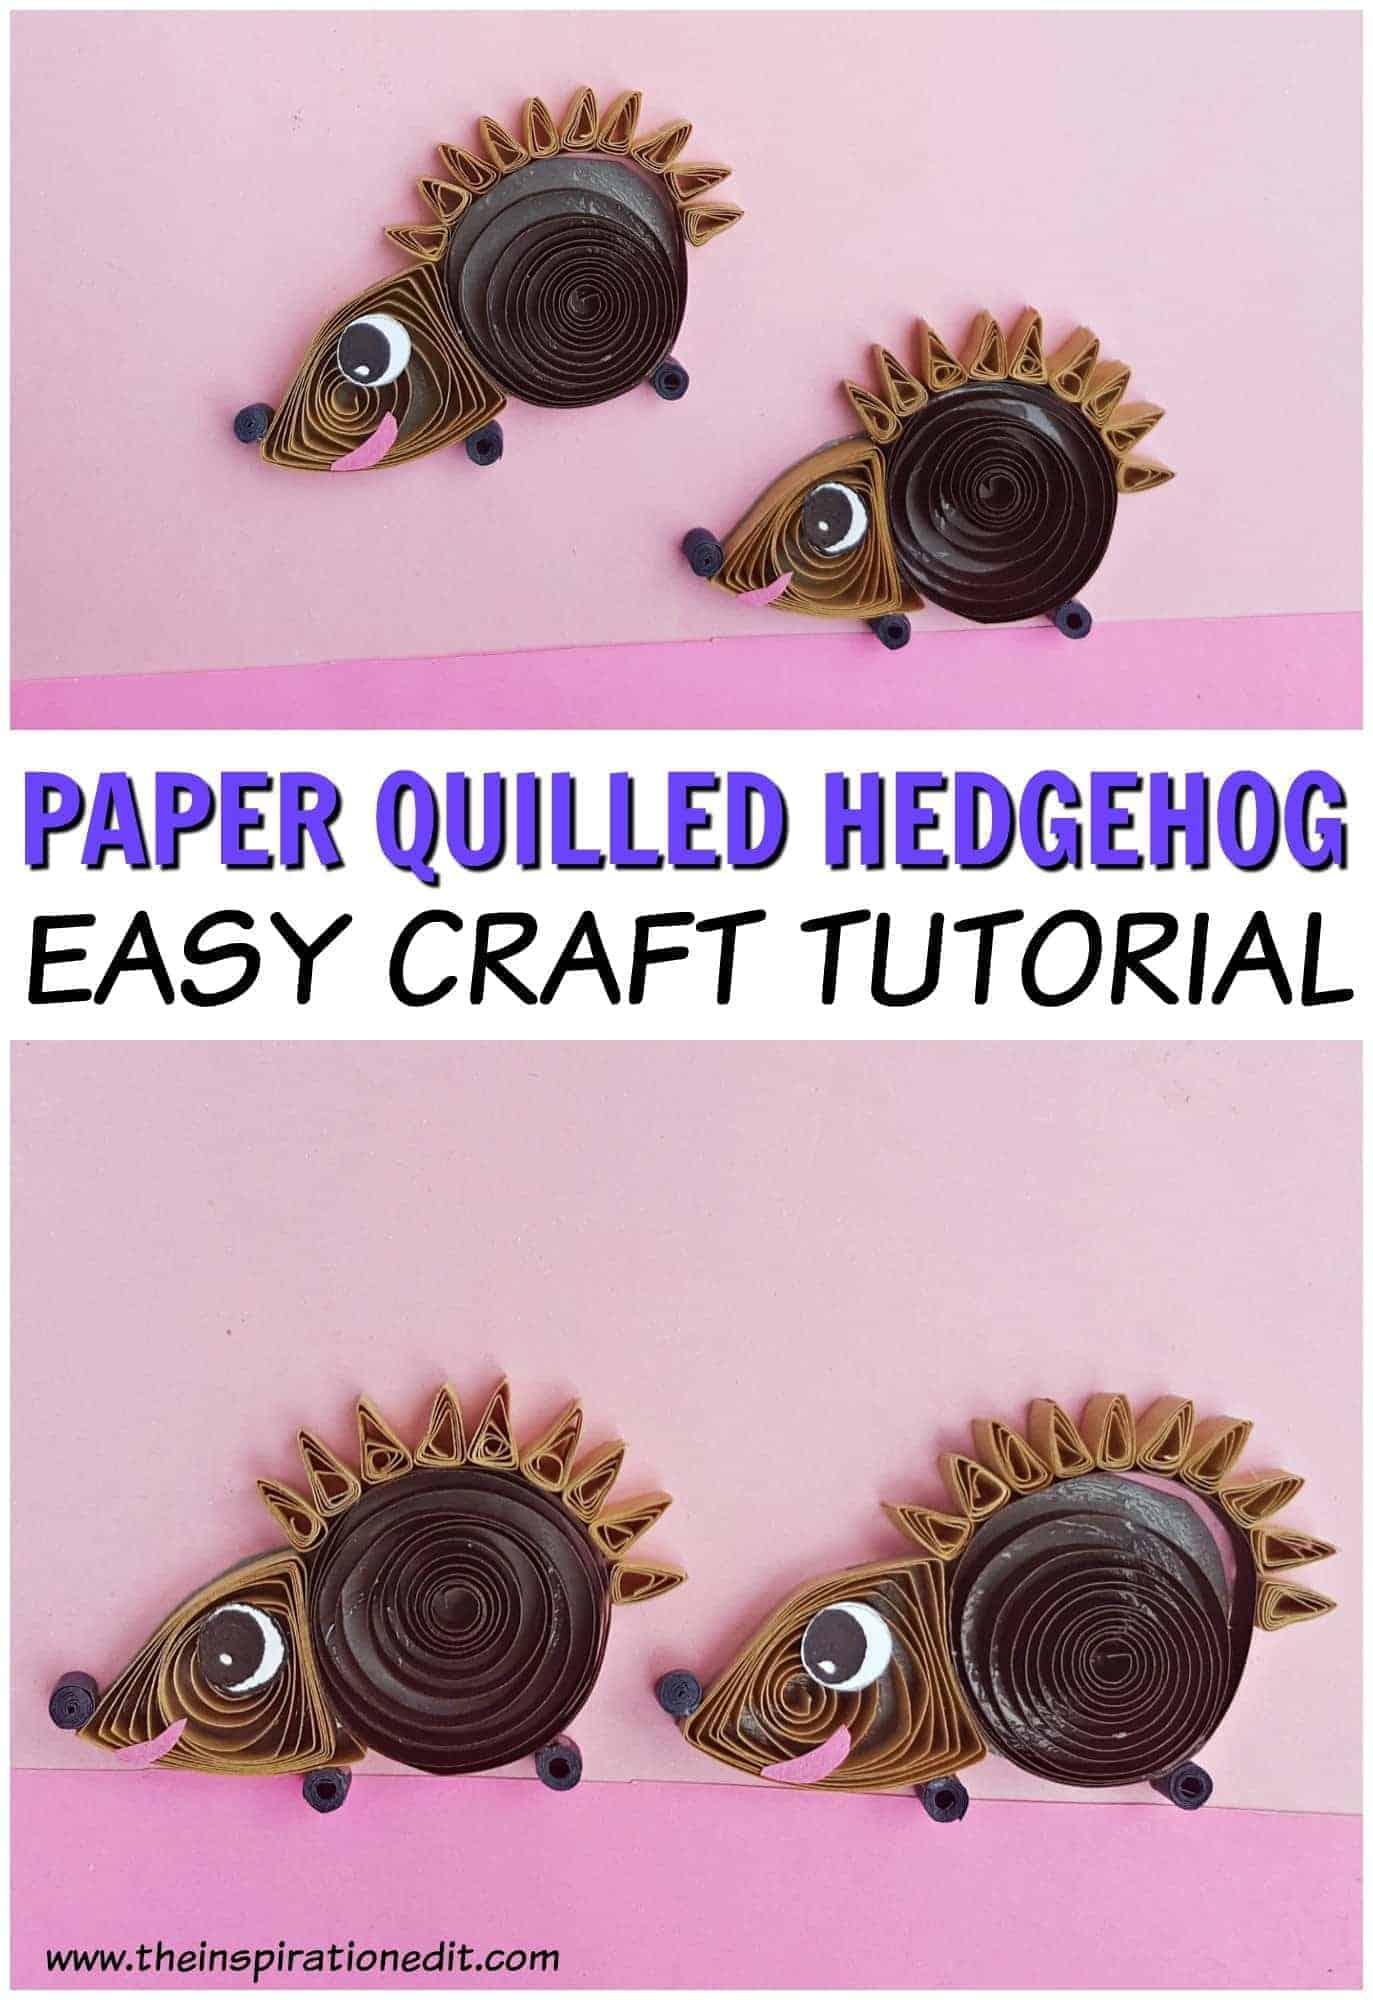 Hedgehog quilling craft